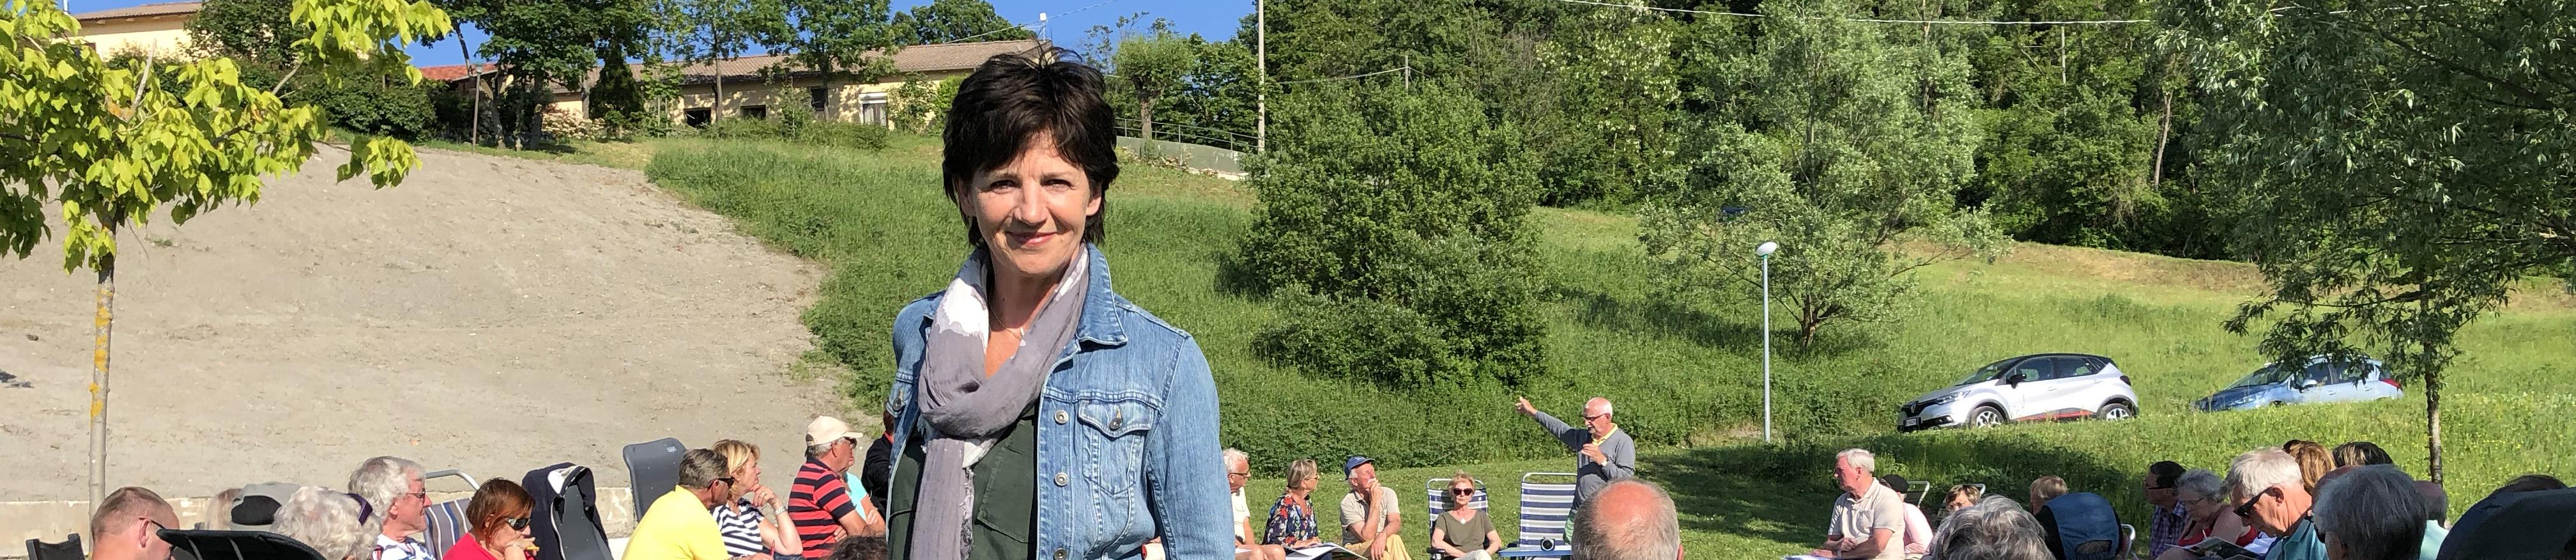 Zachte Kracht: Martine van Os, tv-presentator